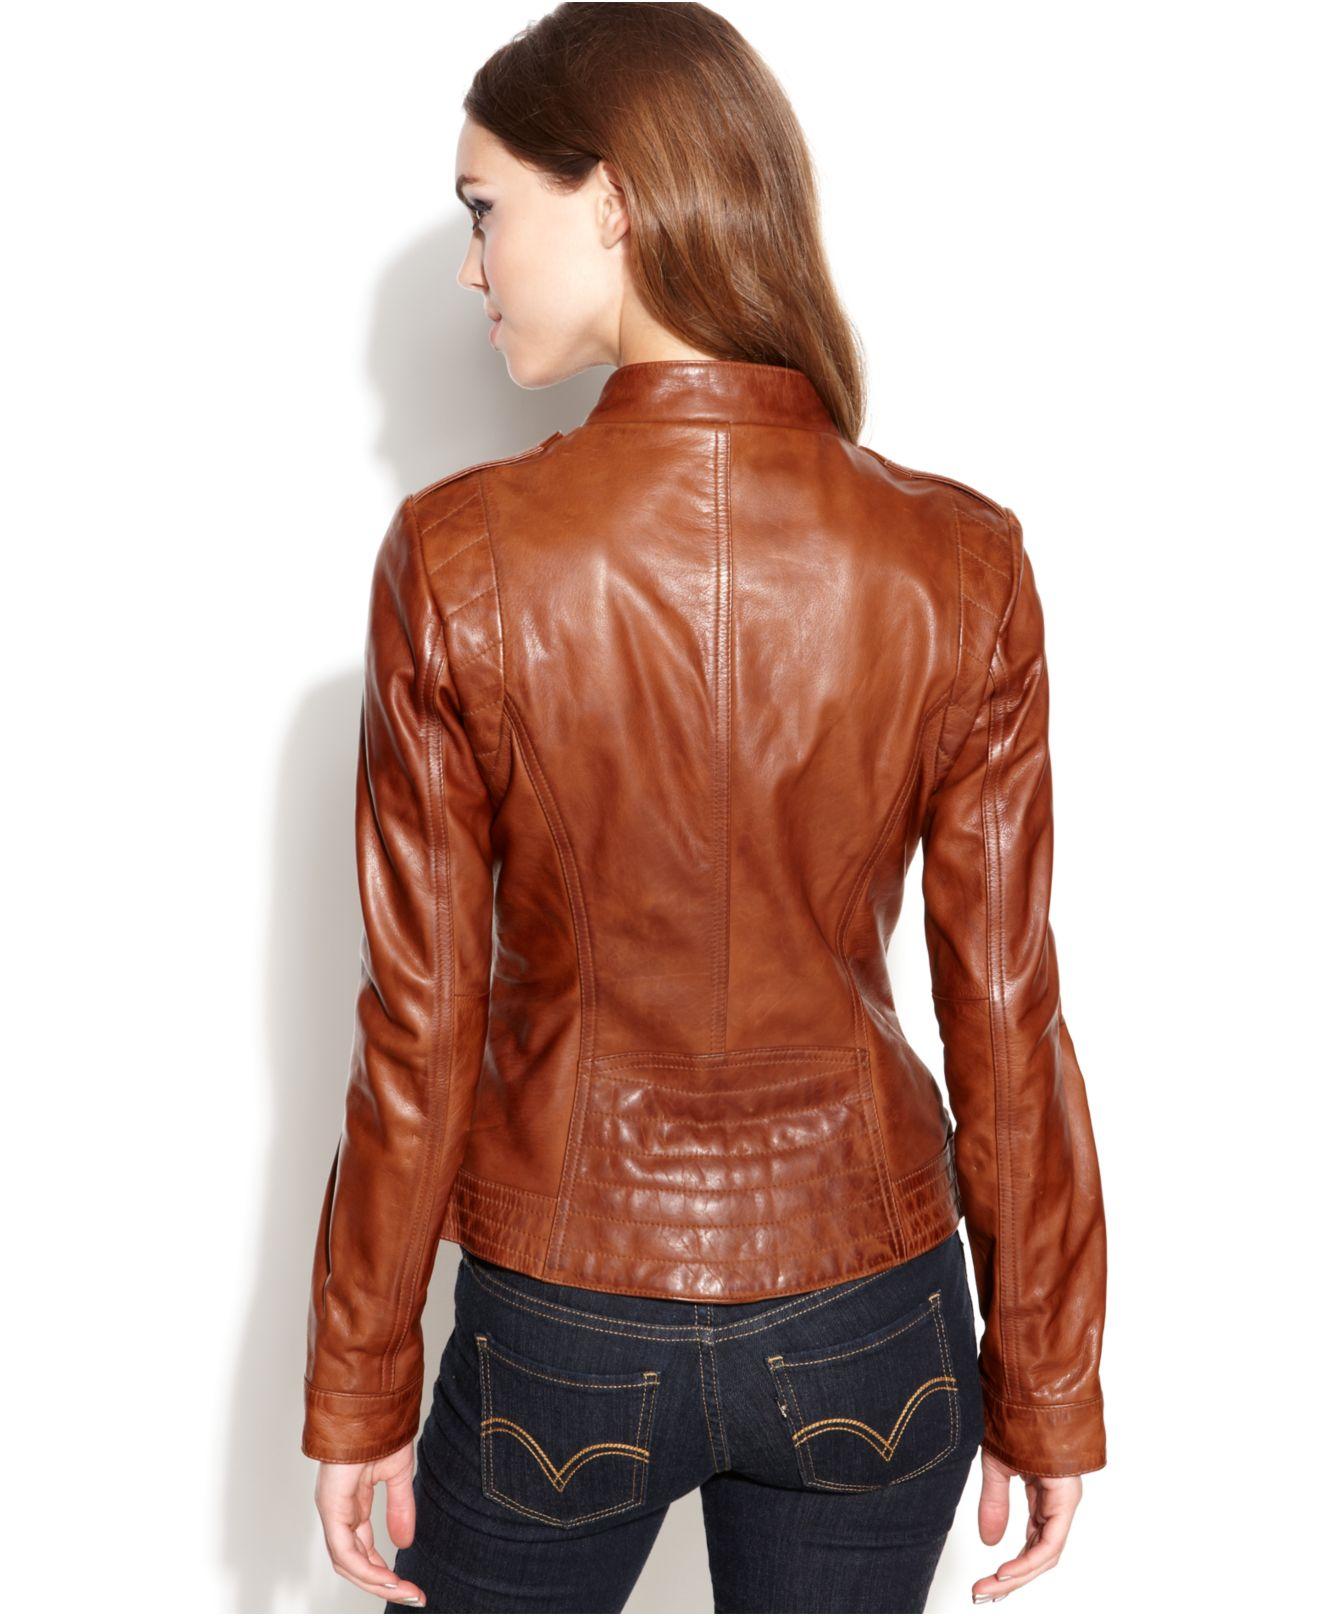 745b2f22801da Guess Asymmetrical Zip Front Leather Jacket - Cairoamani.com